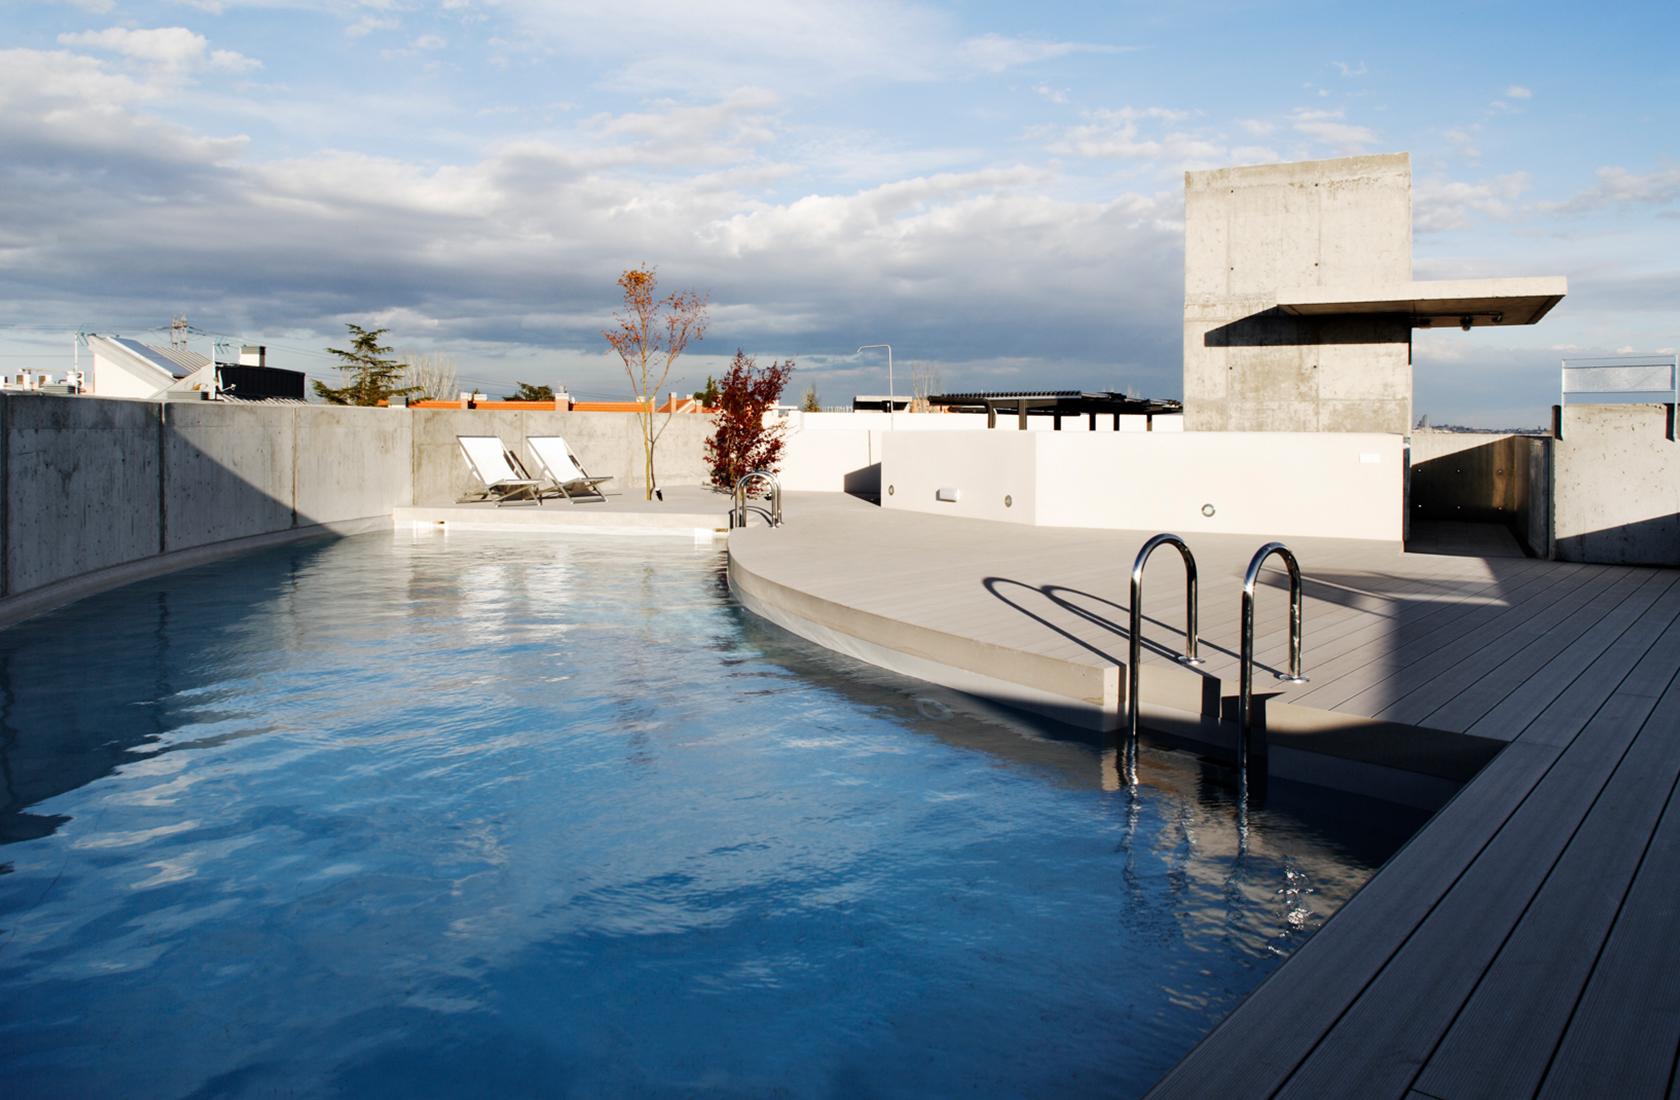 Promocion almanzora piscina